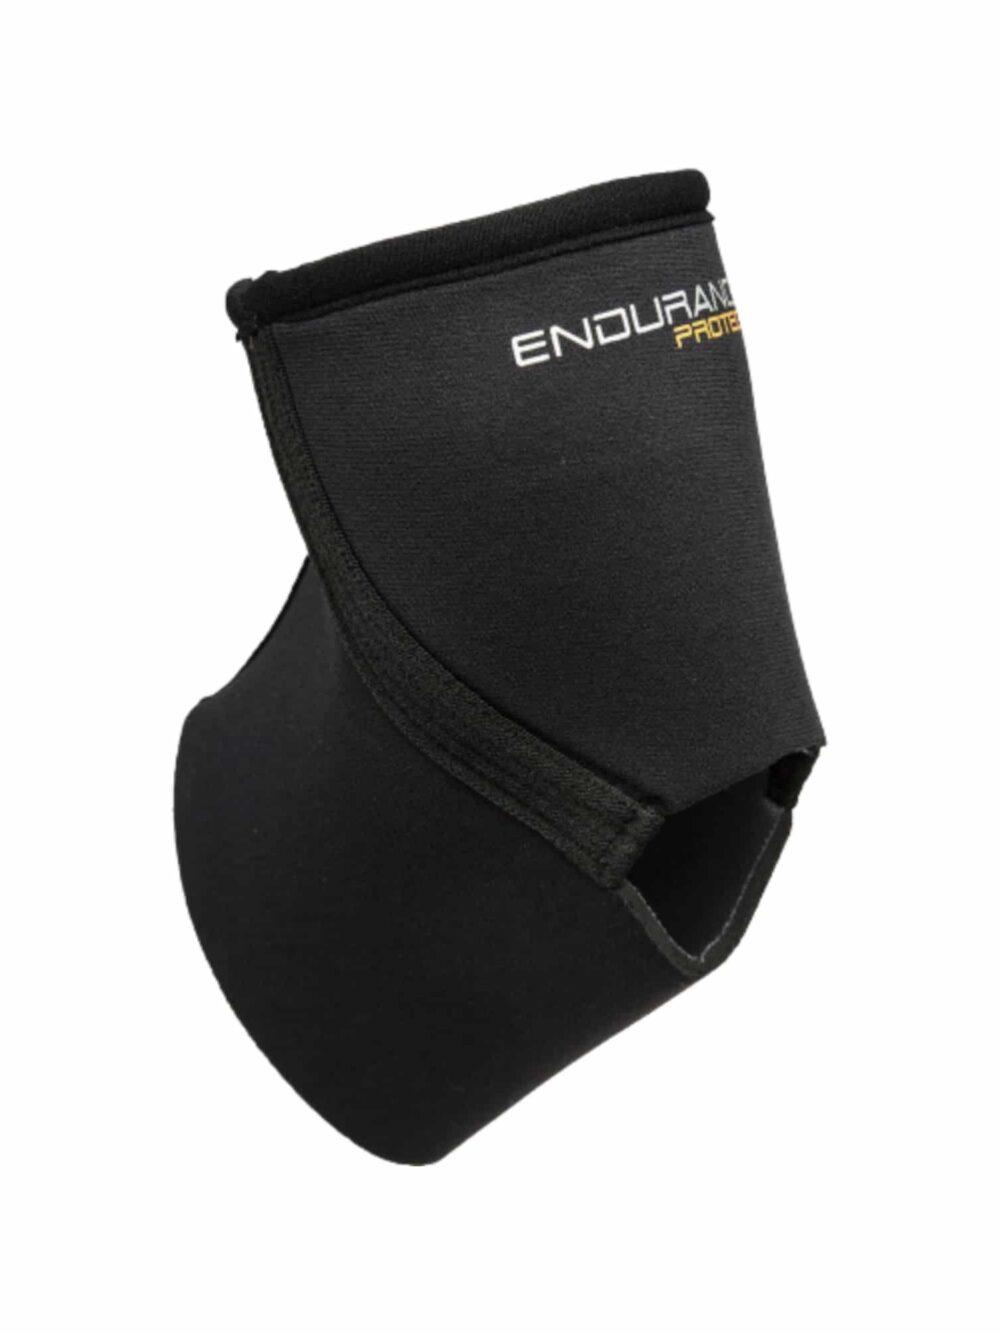 Endurance Protech Neoprene Ankle Support